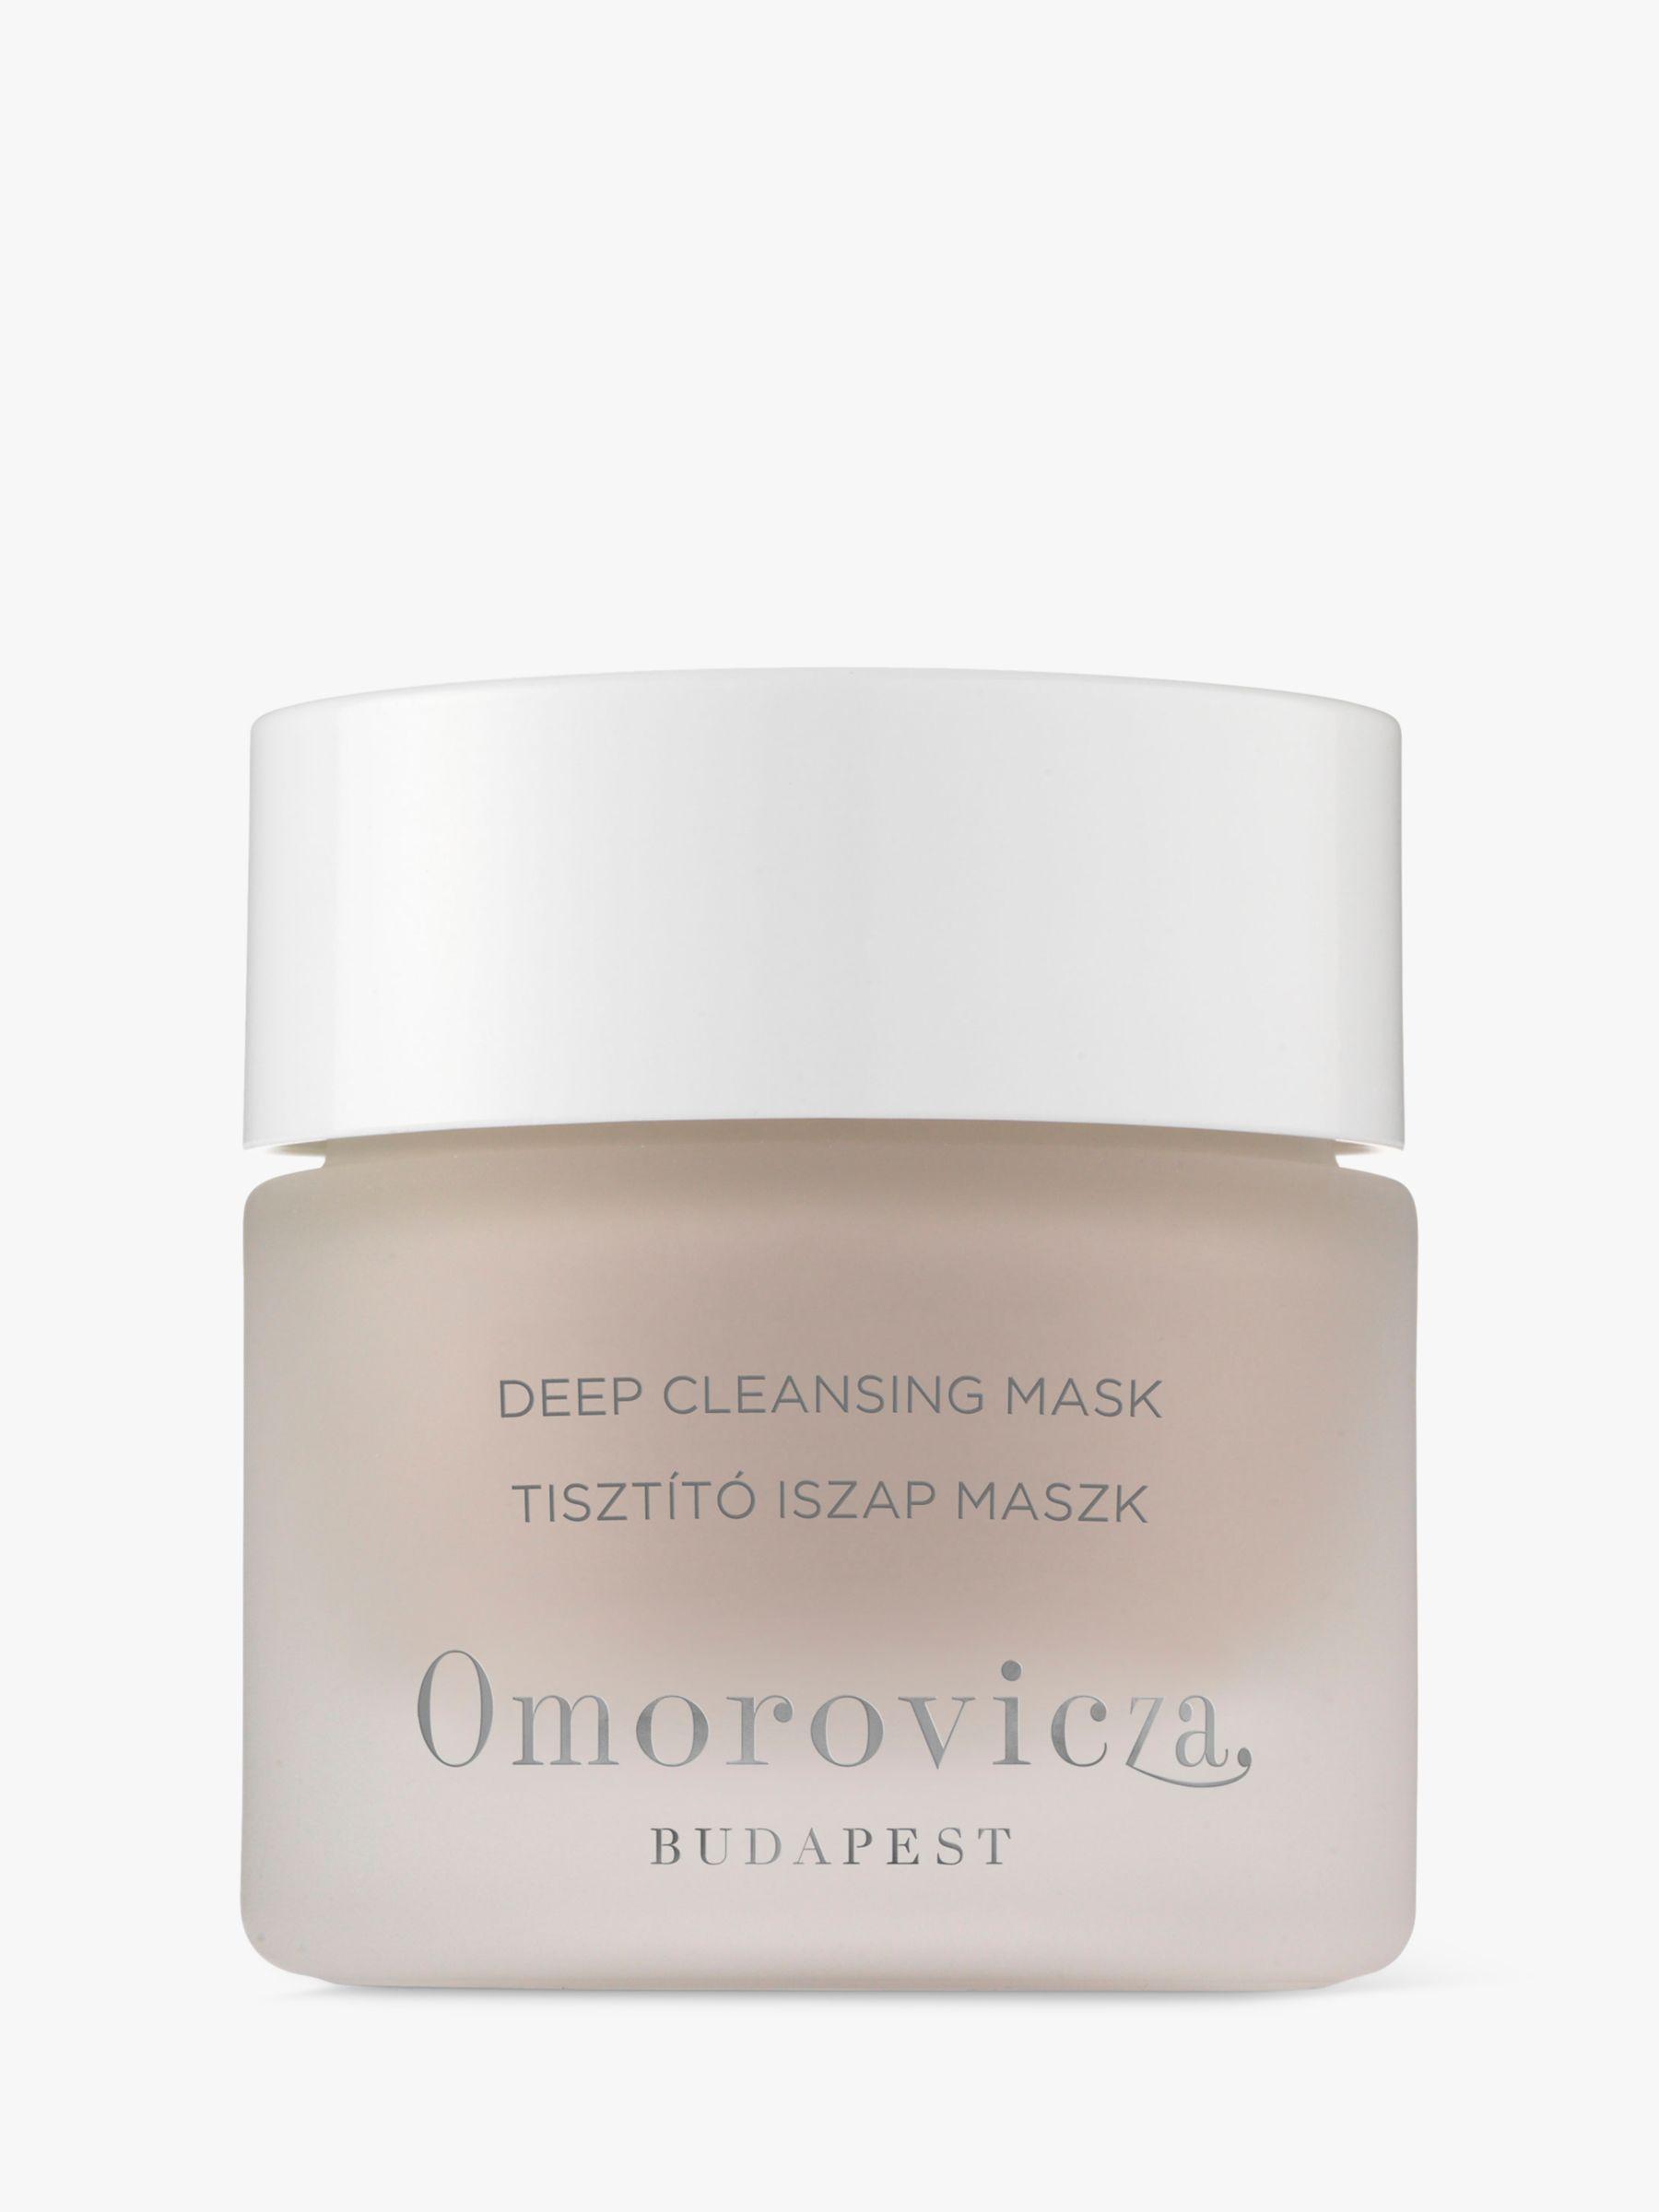 Omorovicza Omorovicza Deep Cleansing Mask, 50ml